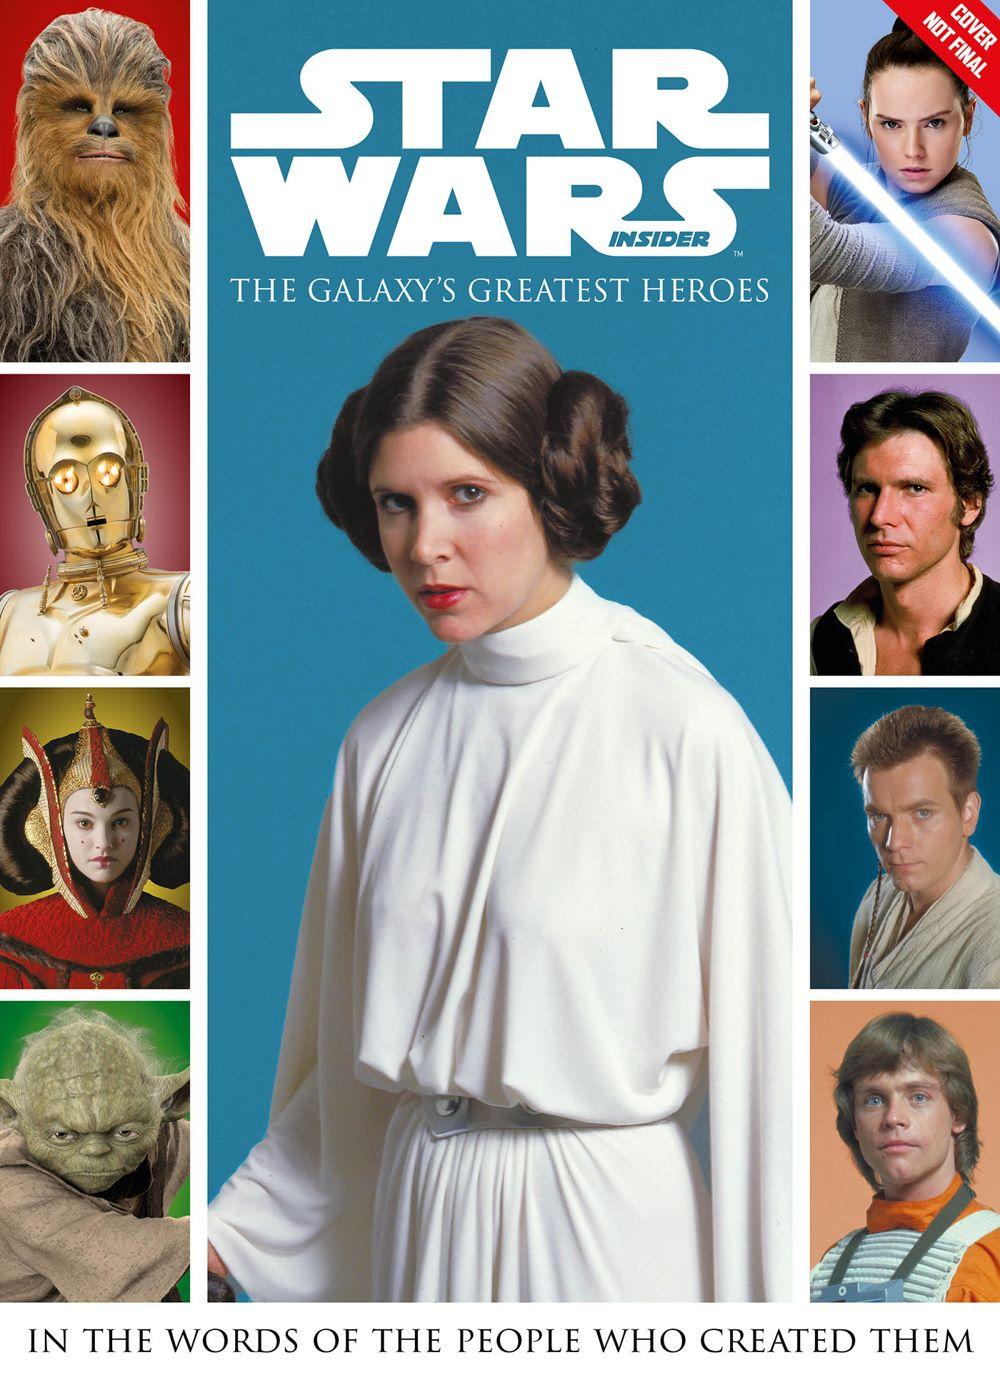 Star-Wars-Heroes Titan Comics May 2021 Solicitations